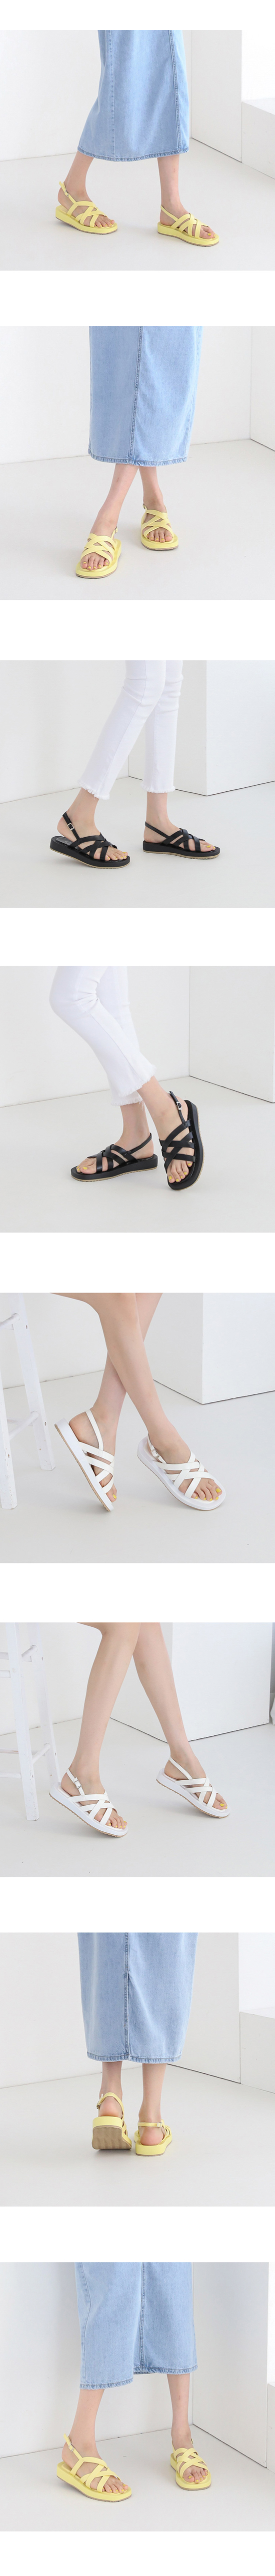 Cross Strap Flat Sandals 3cm Yellow